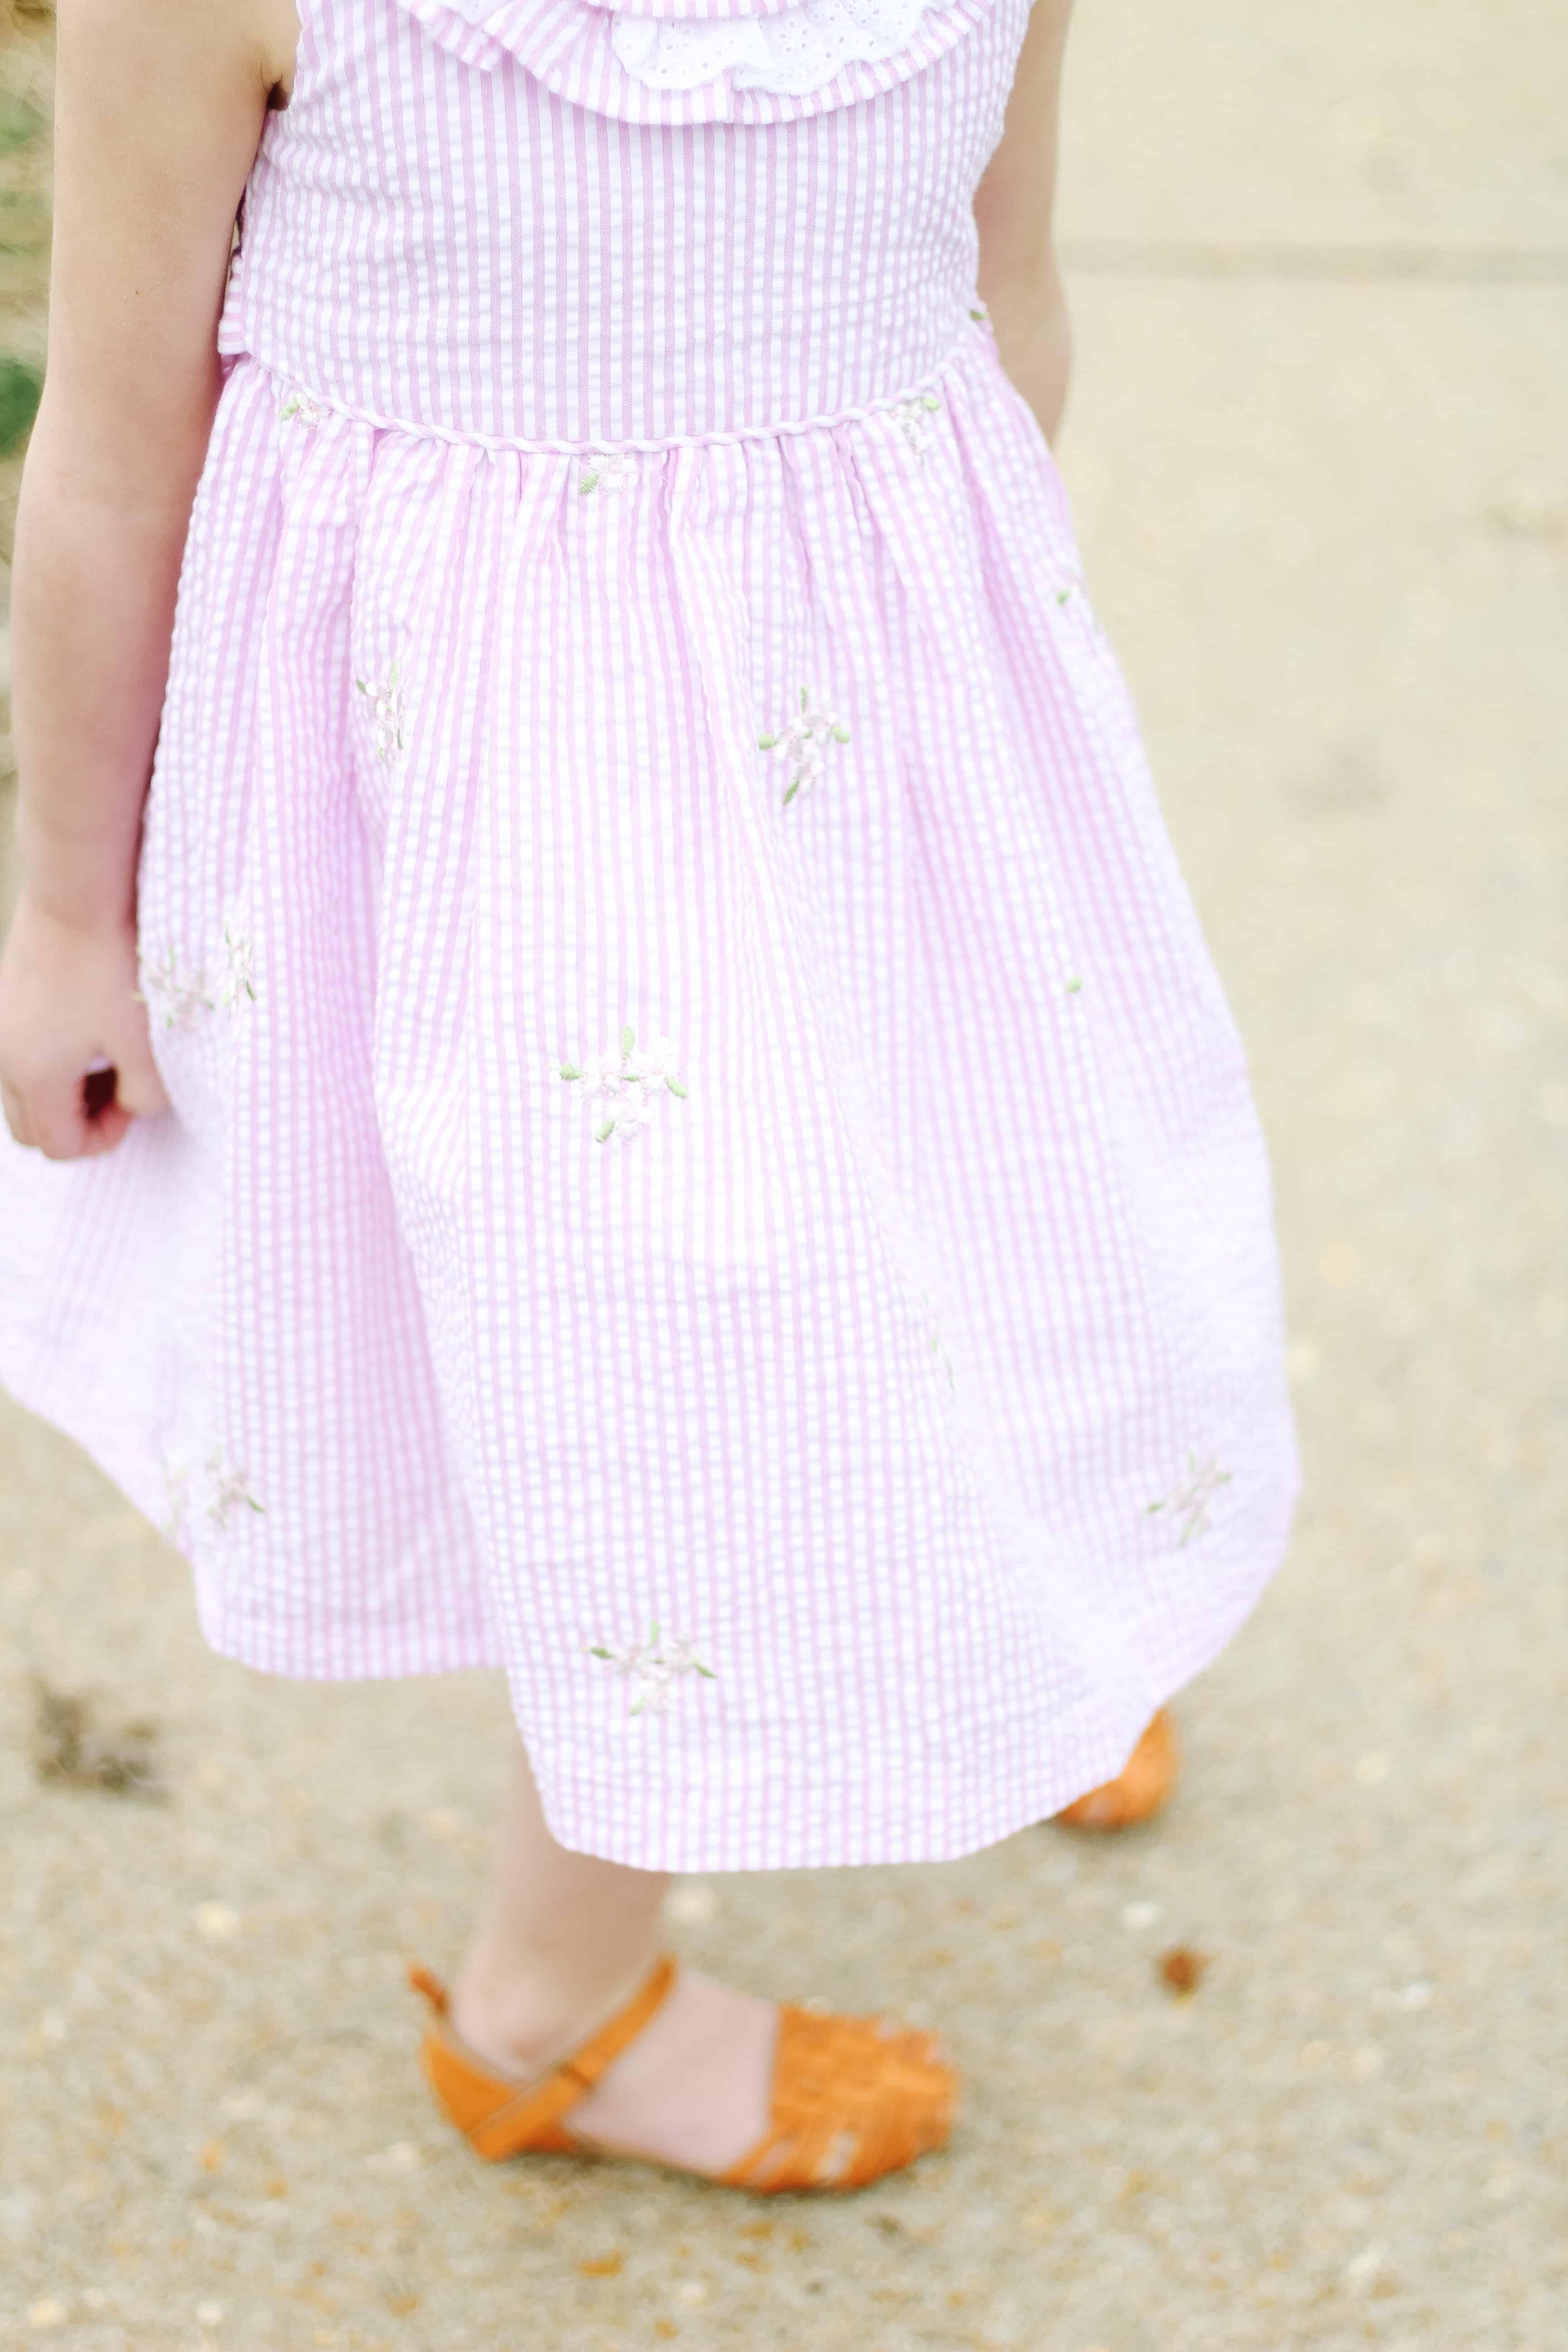 Pink floral seersucker dress for girl